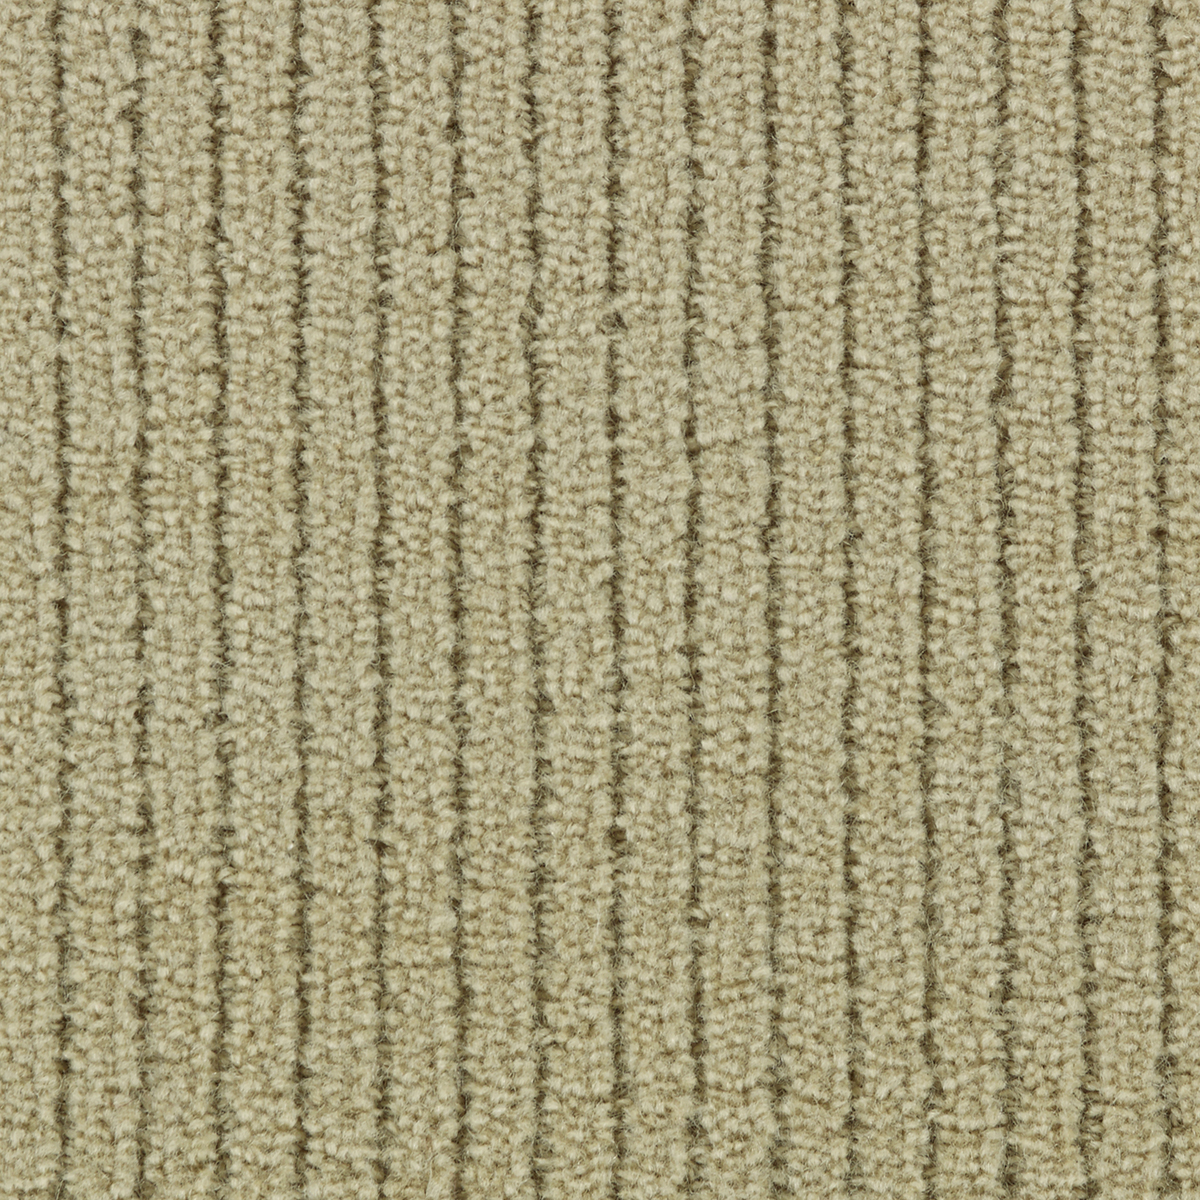 Costa Mesa J Mish Mills Wool Carpet Rugs